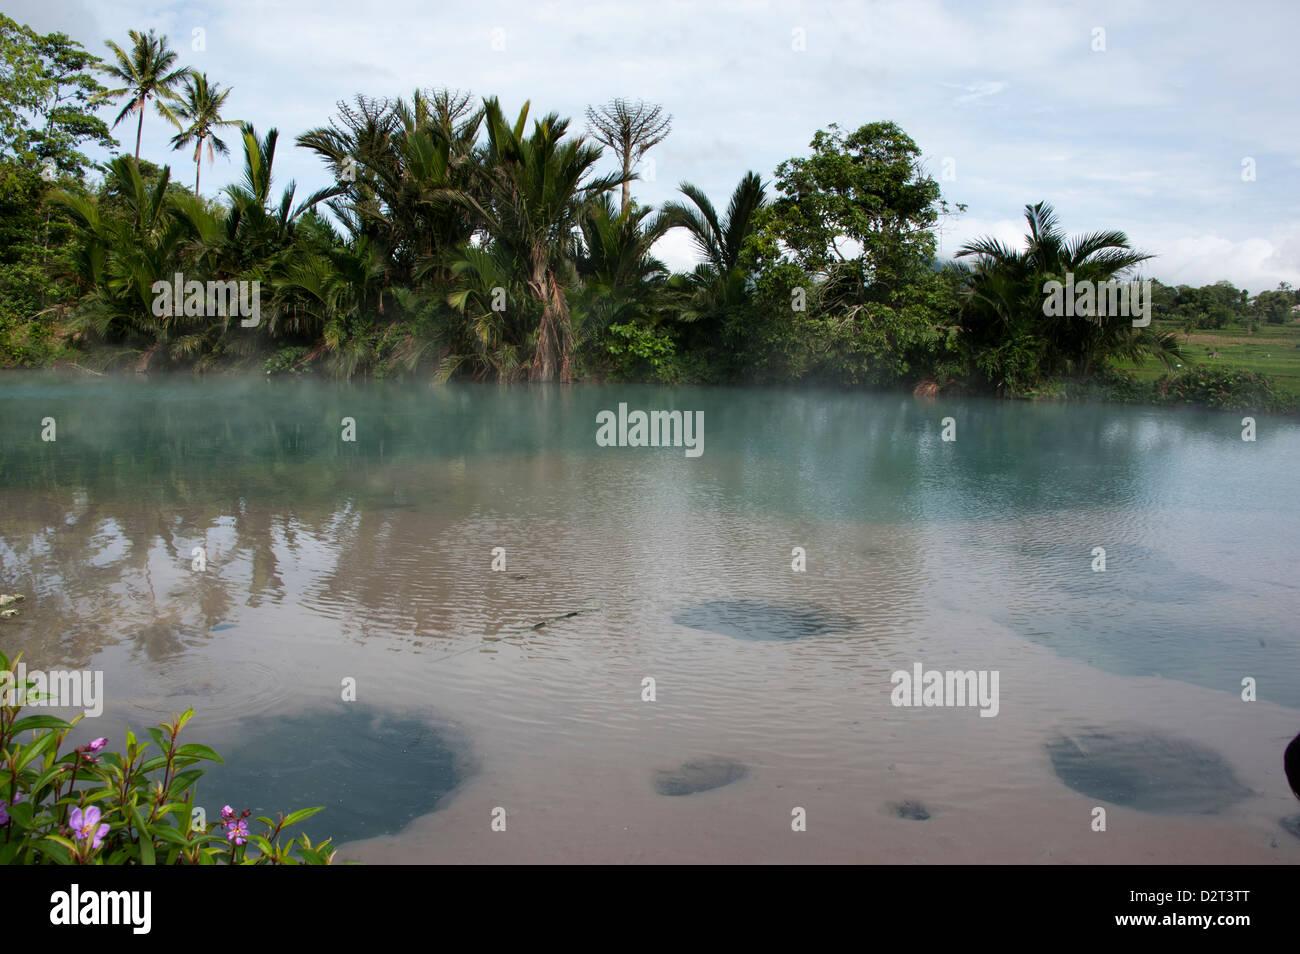 Hot spring pool, Sulawesi, Indonesia, Southeast Asia, Asia - Stock Image